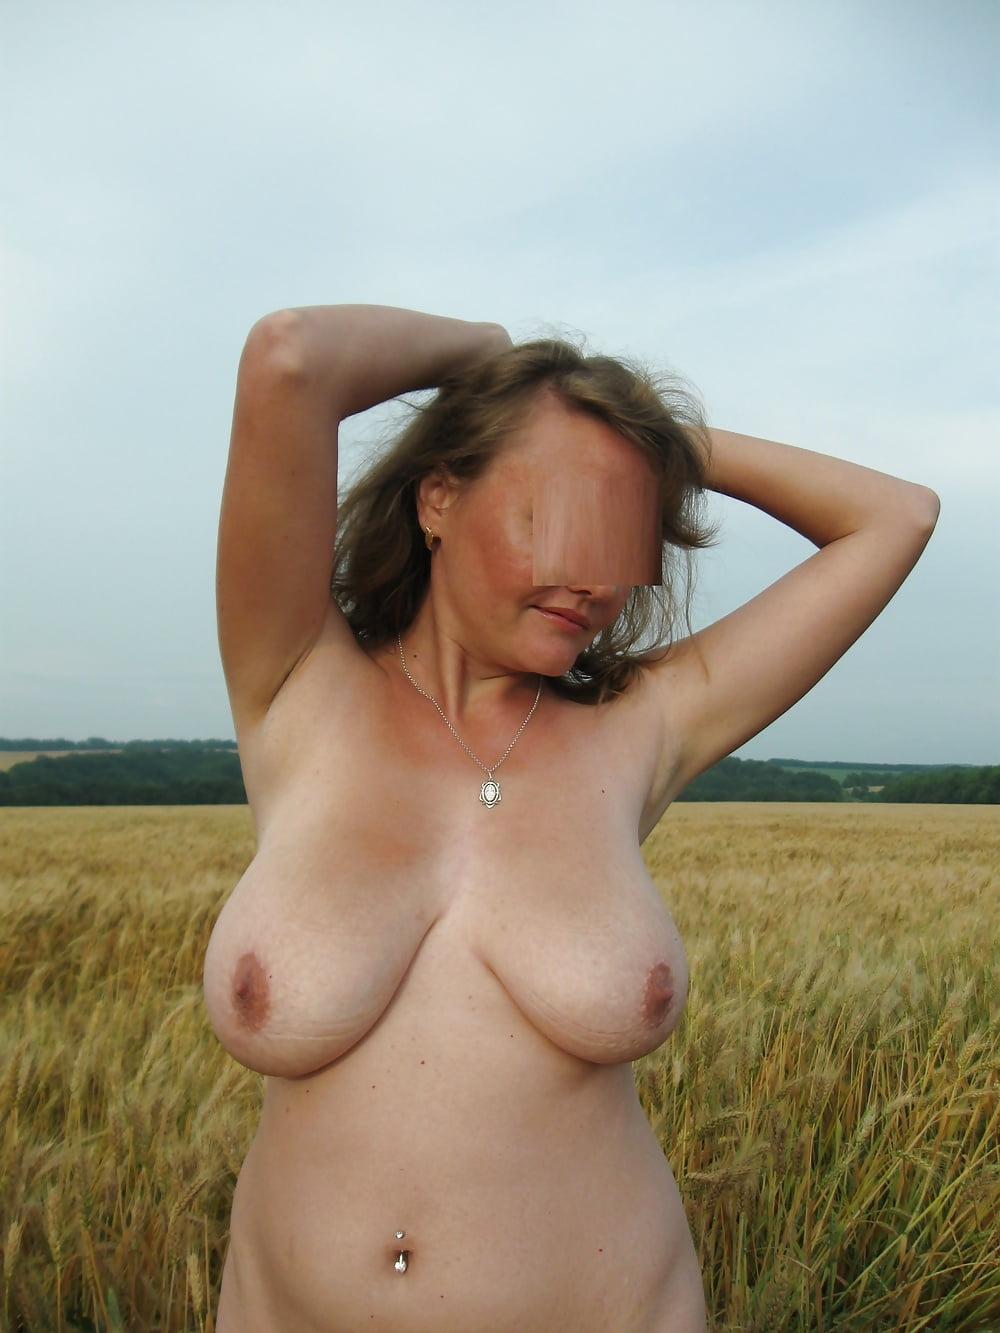 Milf naked russian Russian+milf Pics